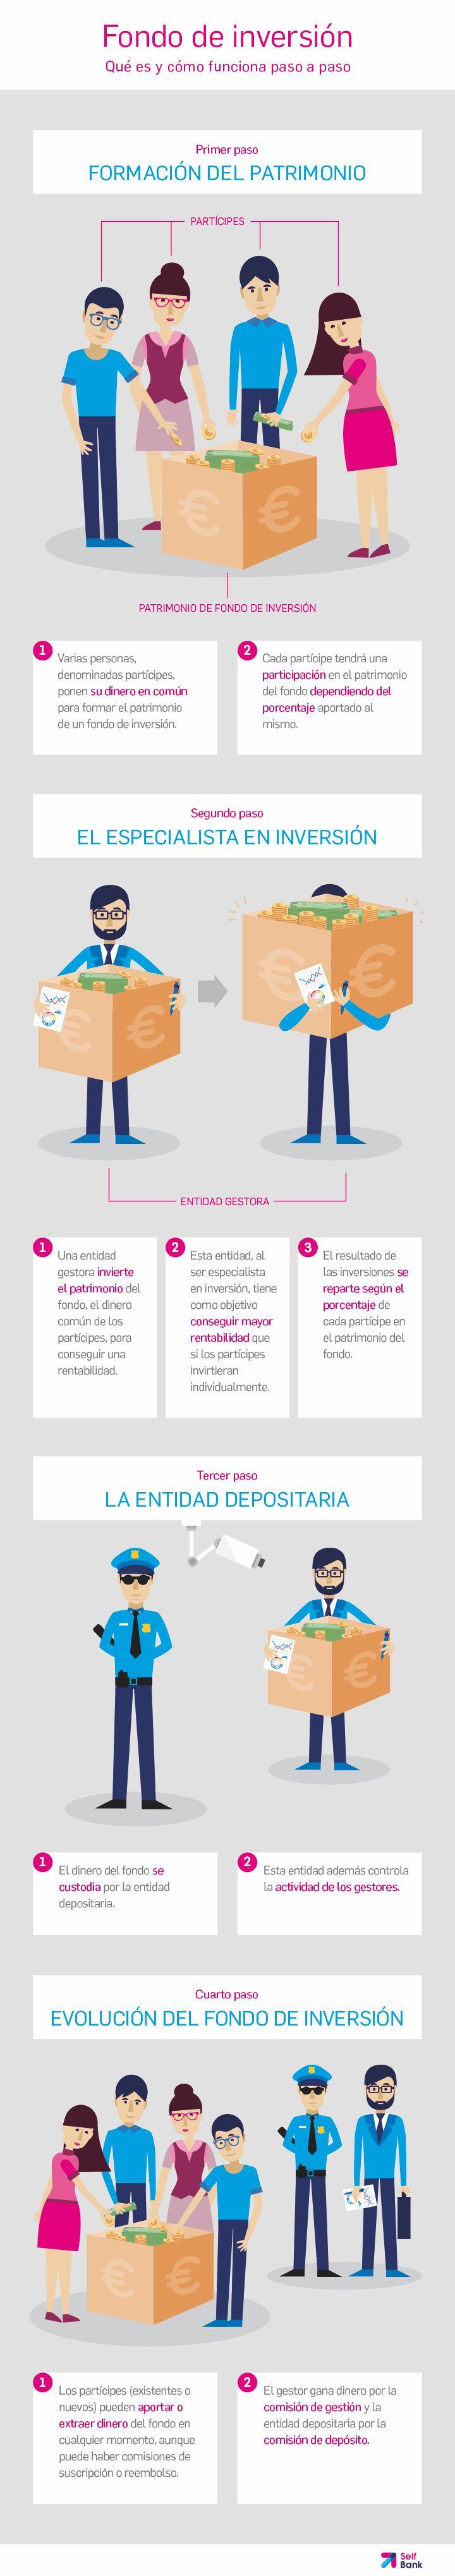 Info-selfbank-fondo-inversión.png (720×4076)